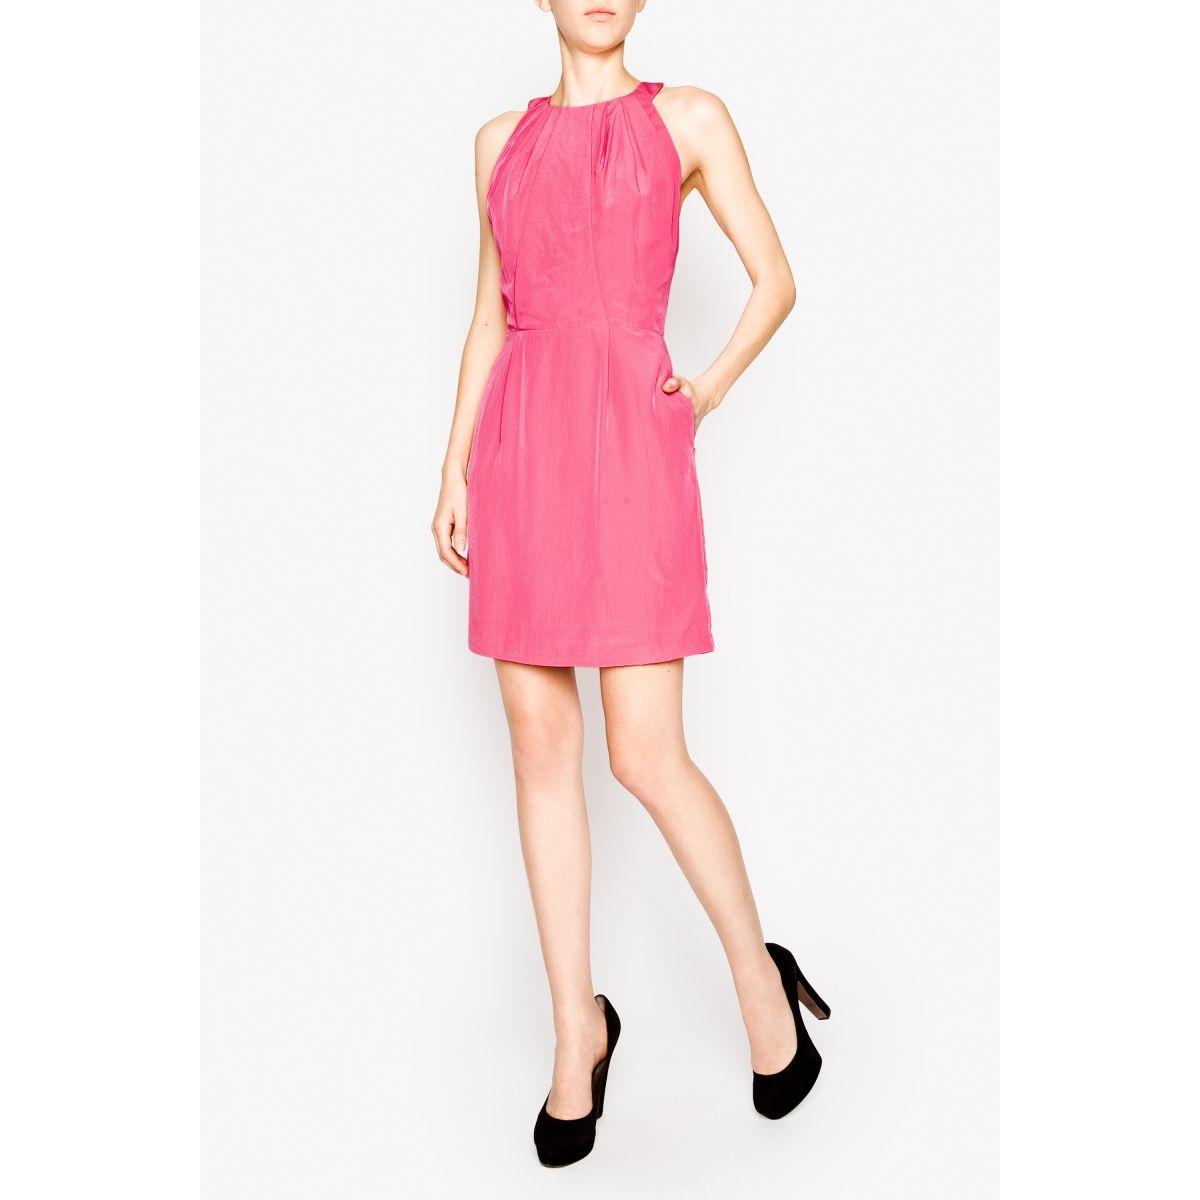 my graduation dress! | Fashion & Styles I love | Pinterest ...